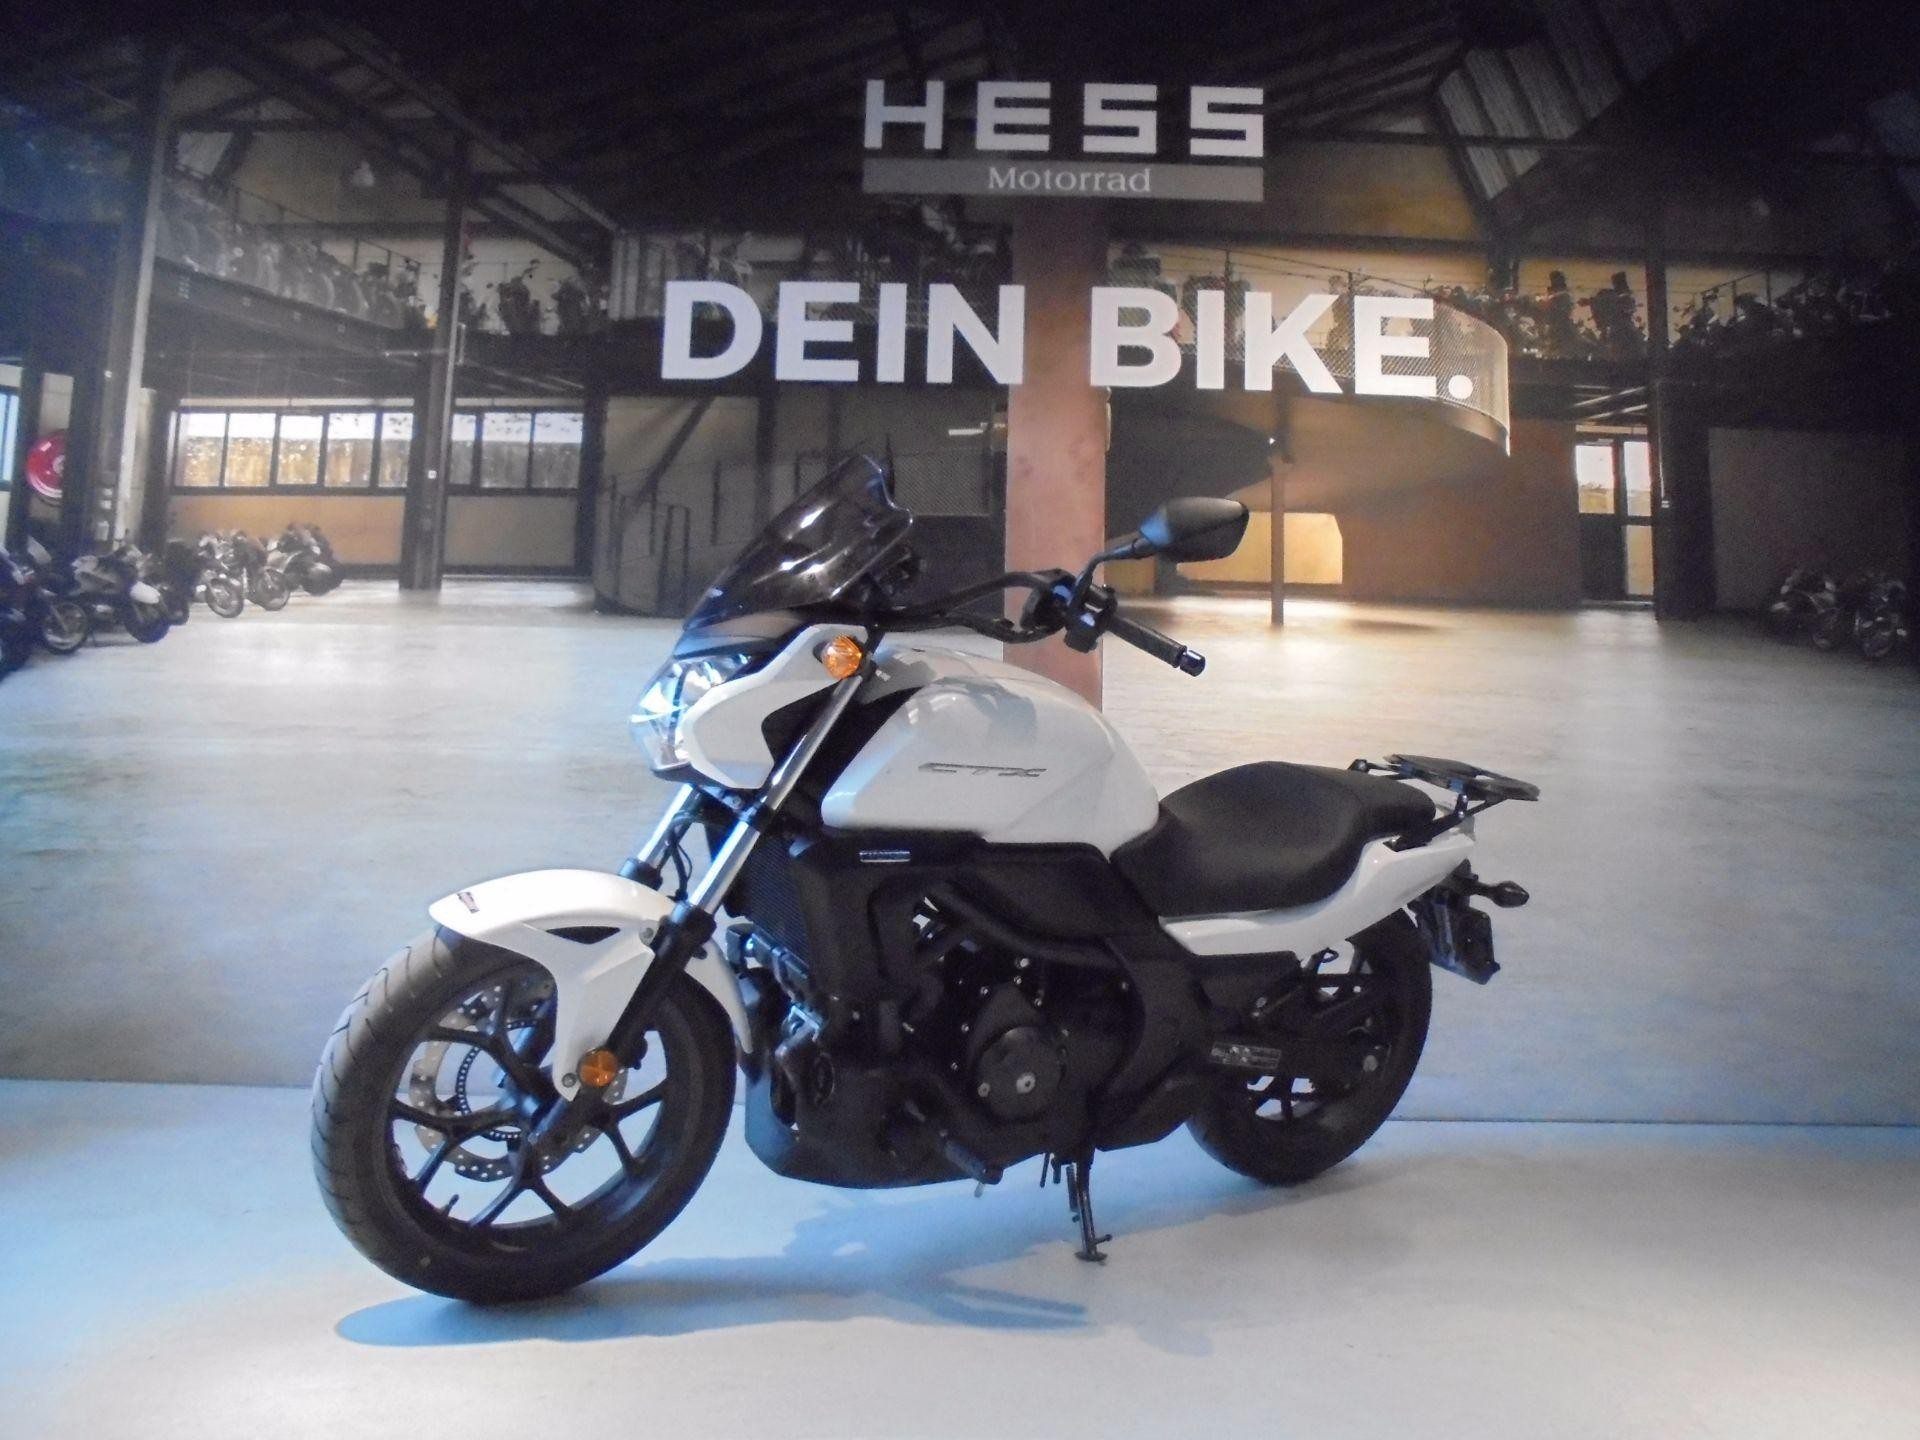 Honda Ctx 700 Nd Abs Hess Motorrad Stettlen